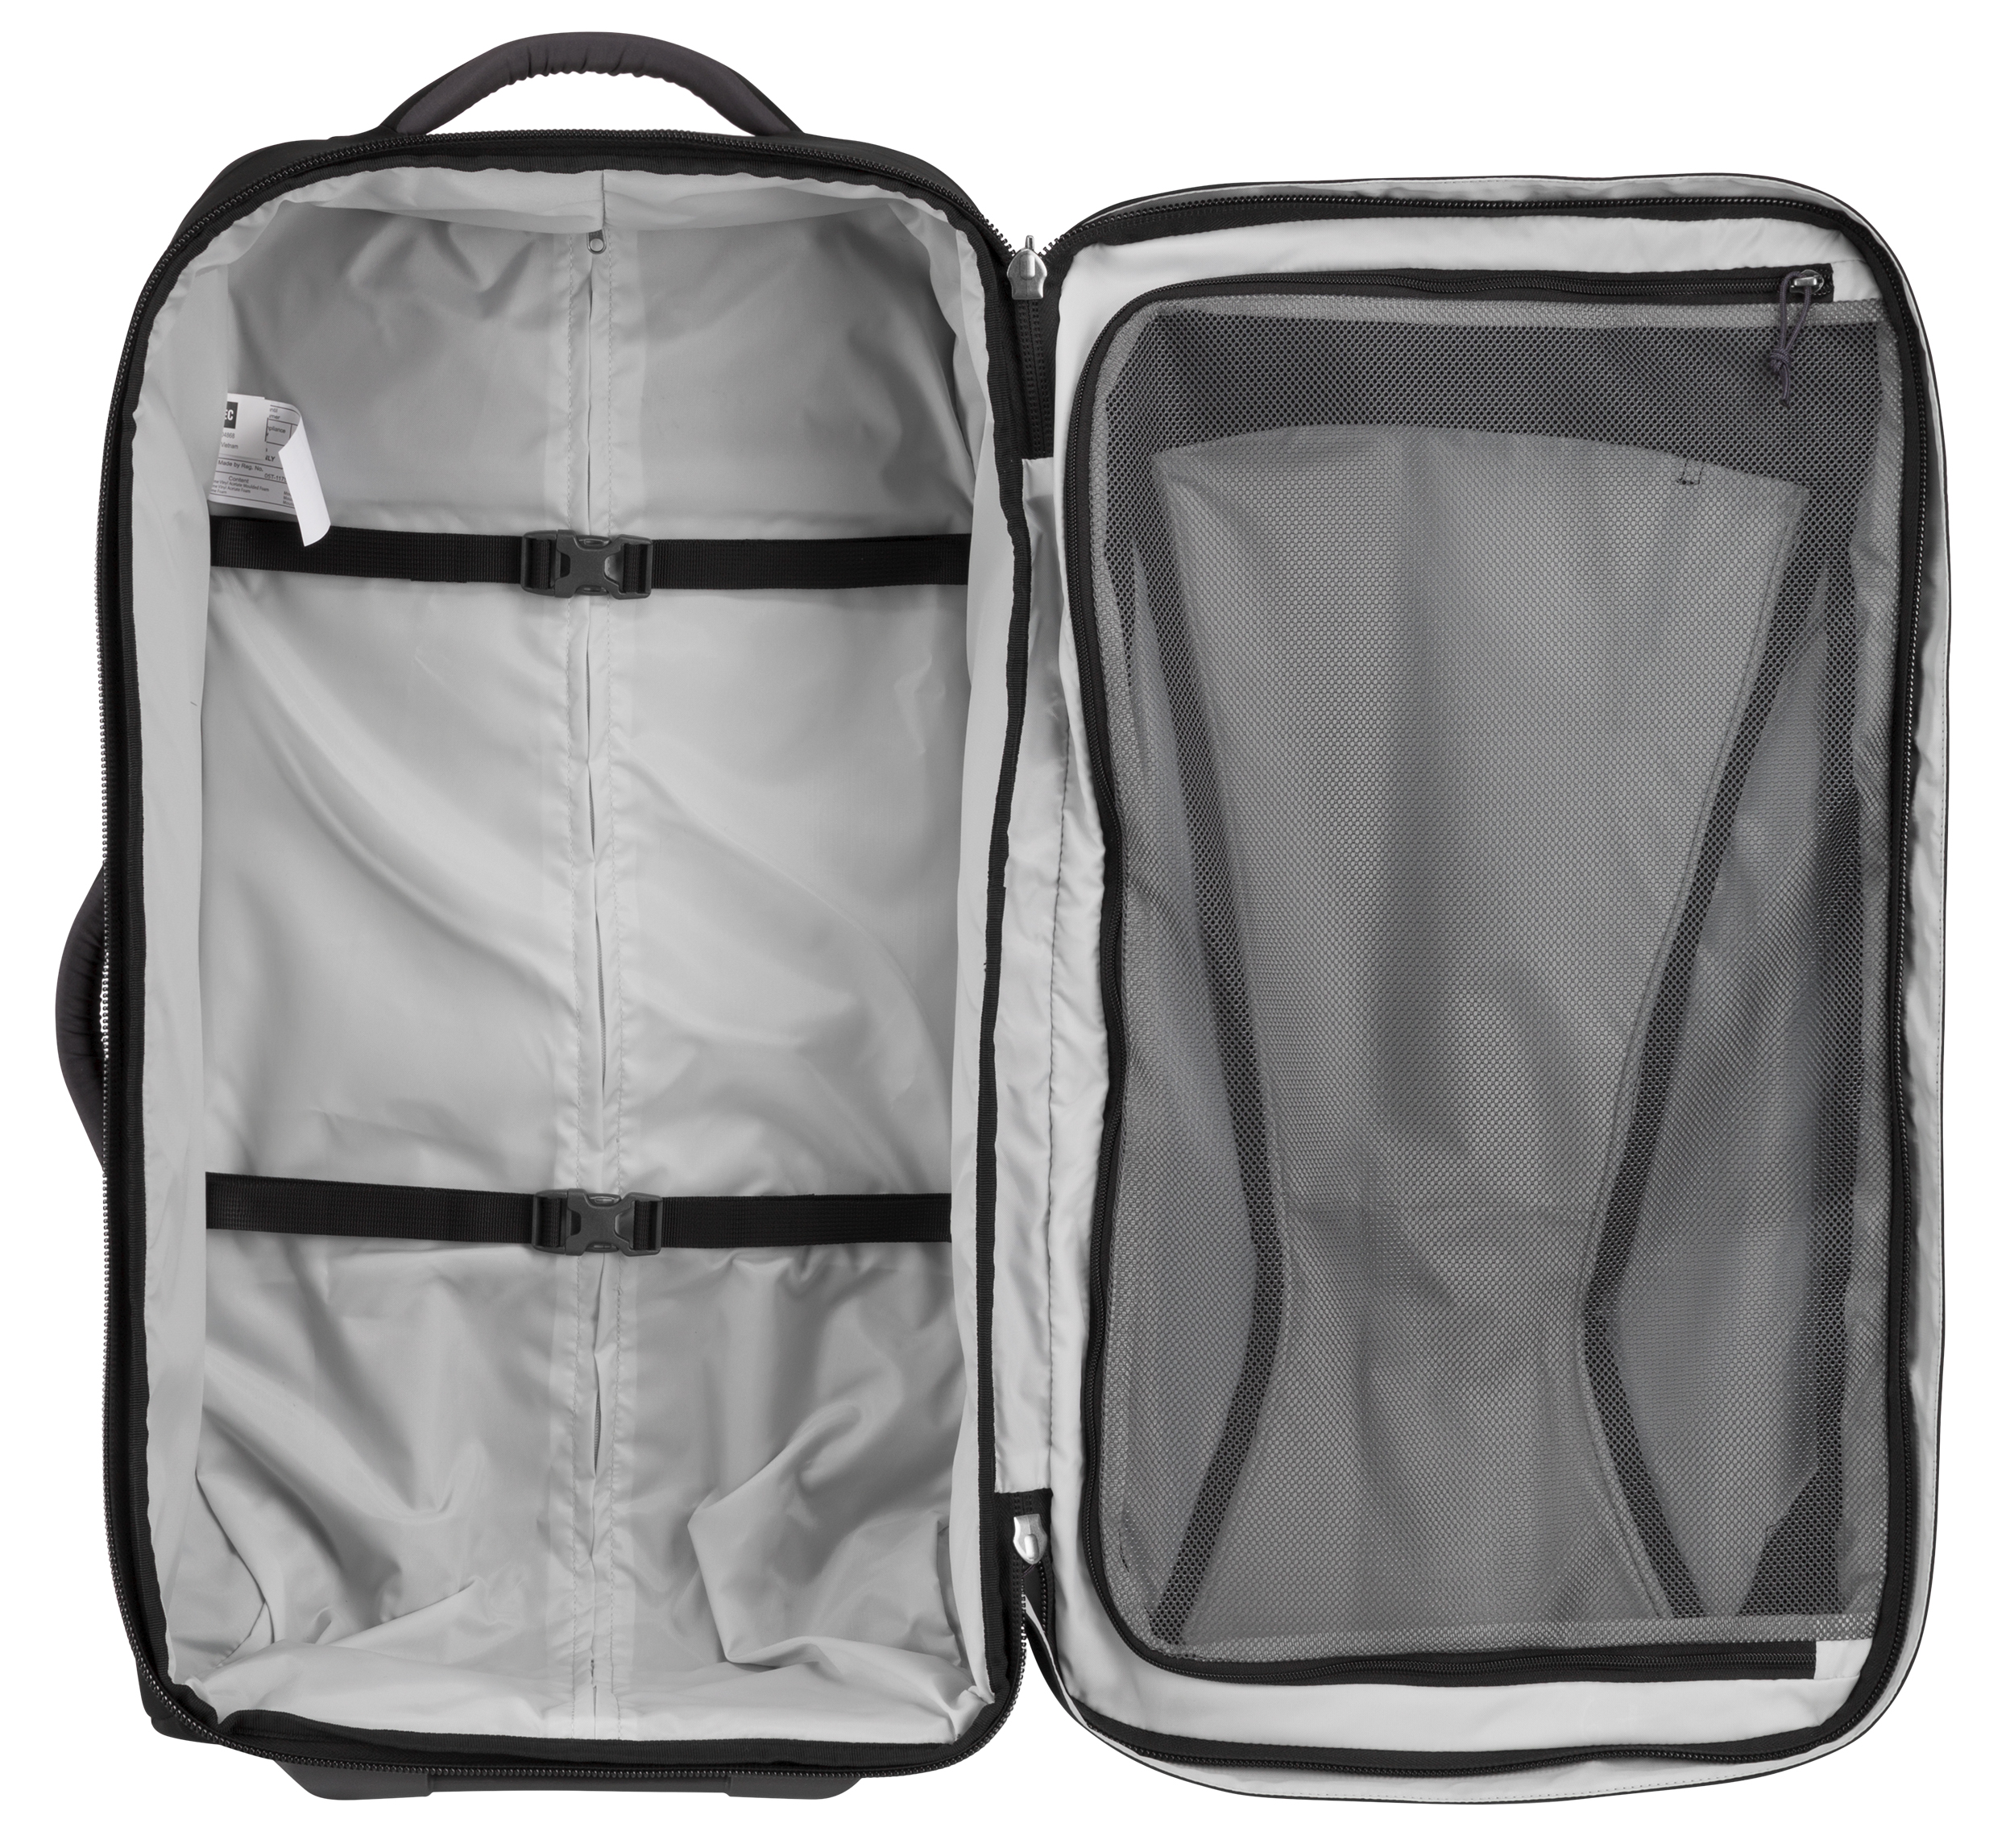 Best Suitcase 2016